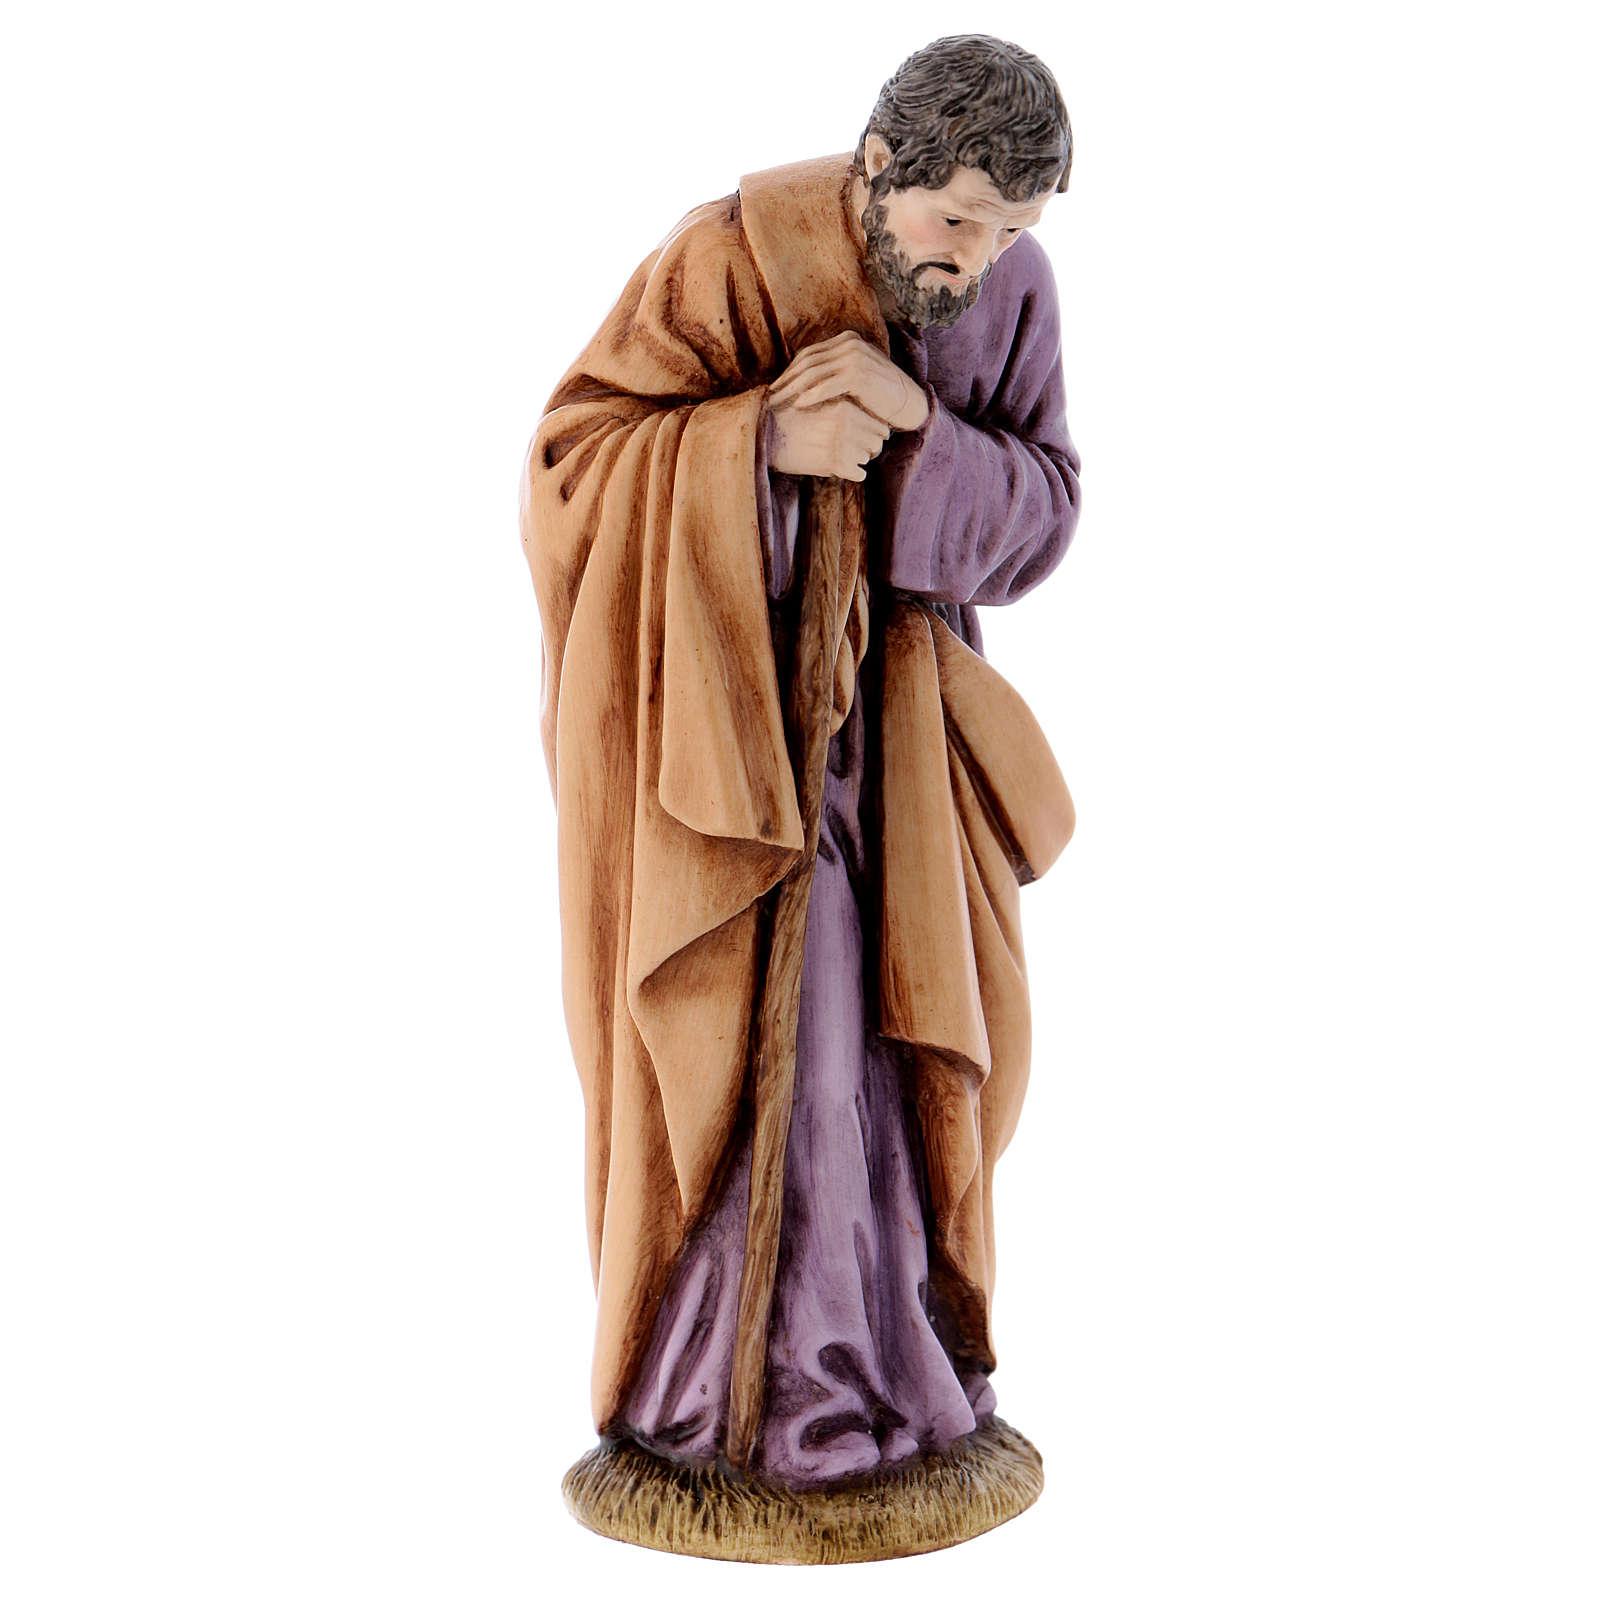 Figurines for Landi nativities, Saint Joseph 11cm 3